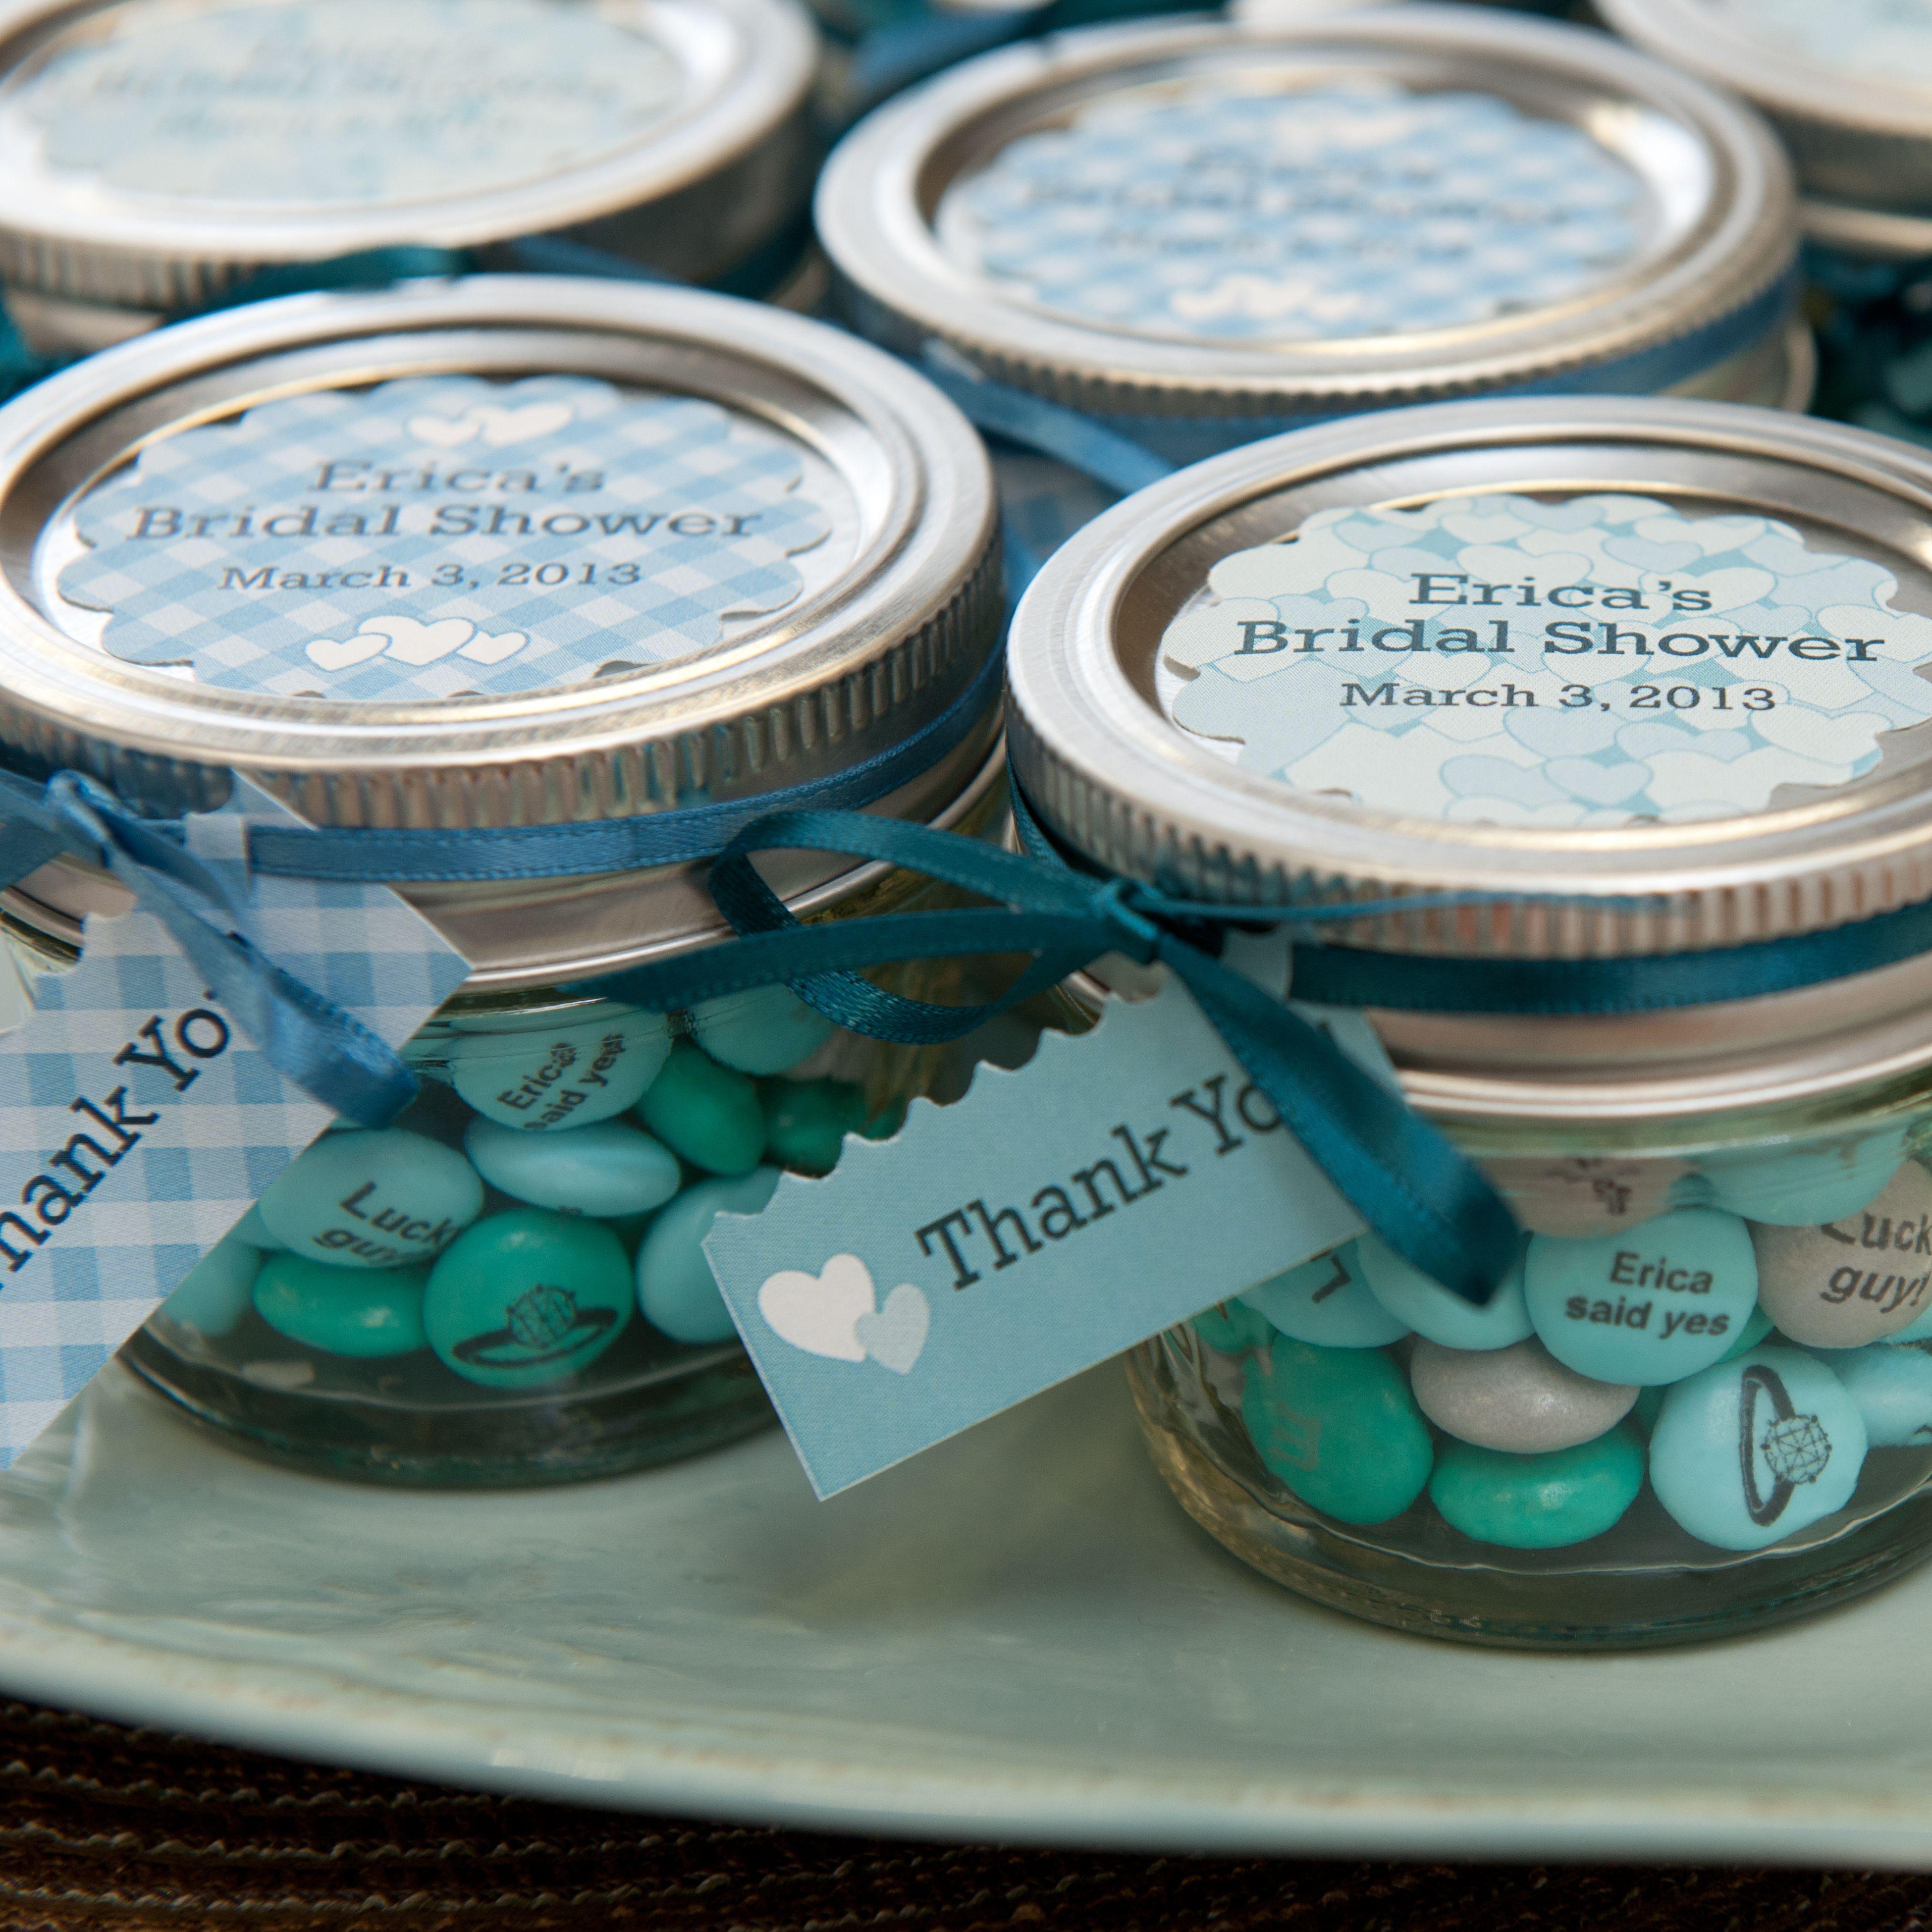 Sweetness in a jar for your bridal shower favors mymms gift desktop diy mason wedding mobile high quality